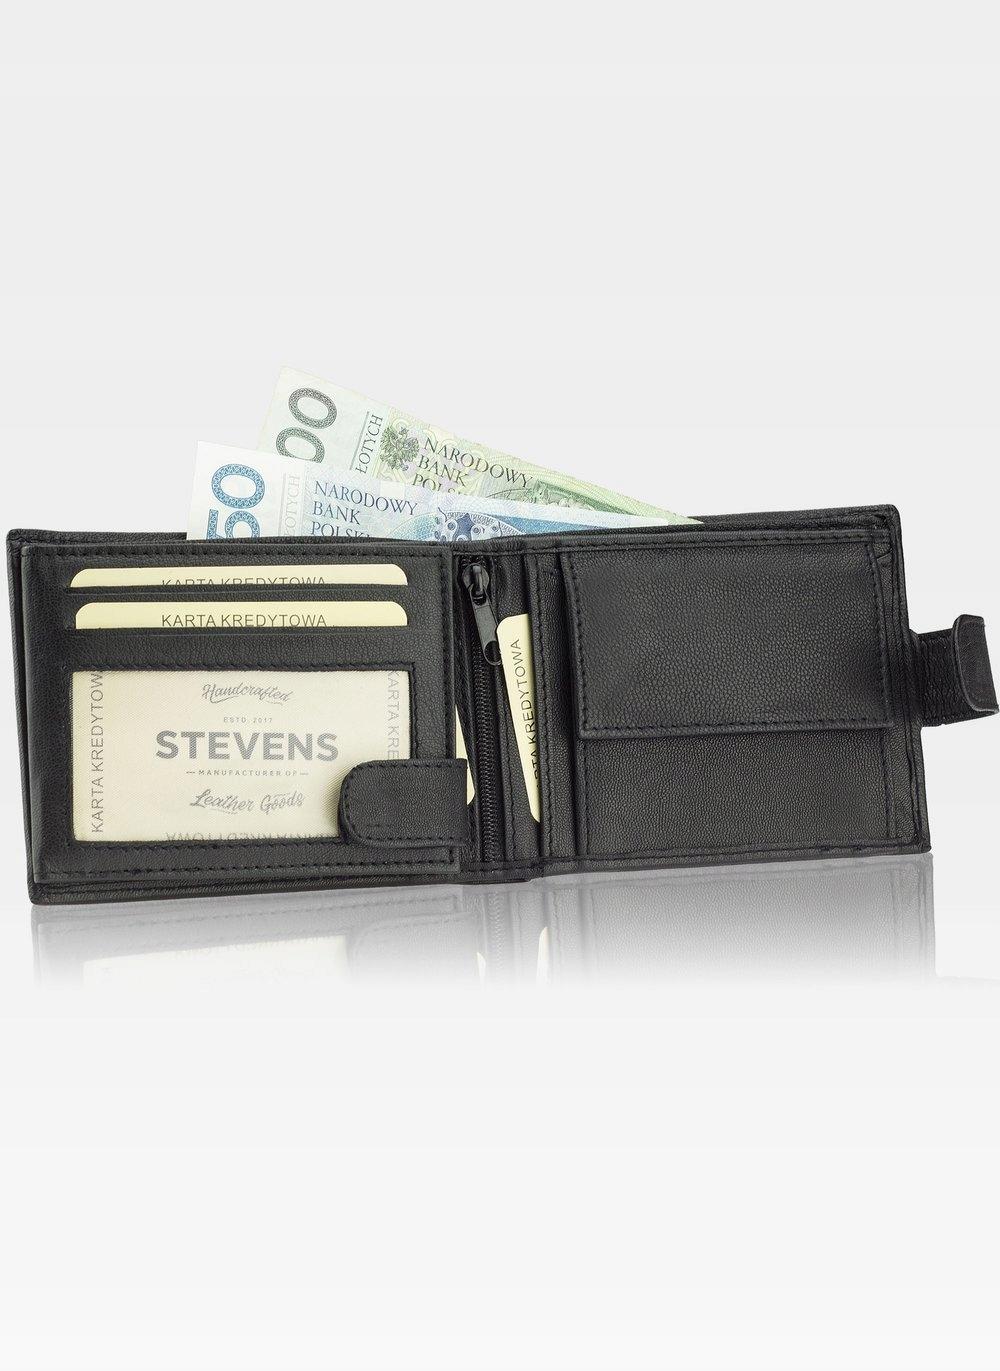 STEVENS GIFT SET Wallet Men's belt LEATHER The dominant material is natural leather